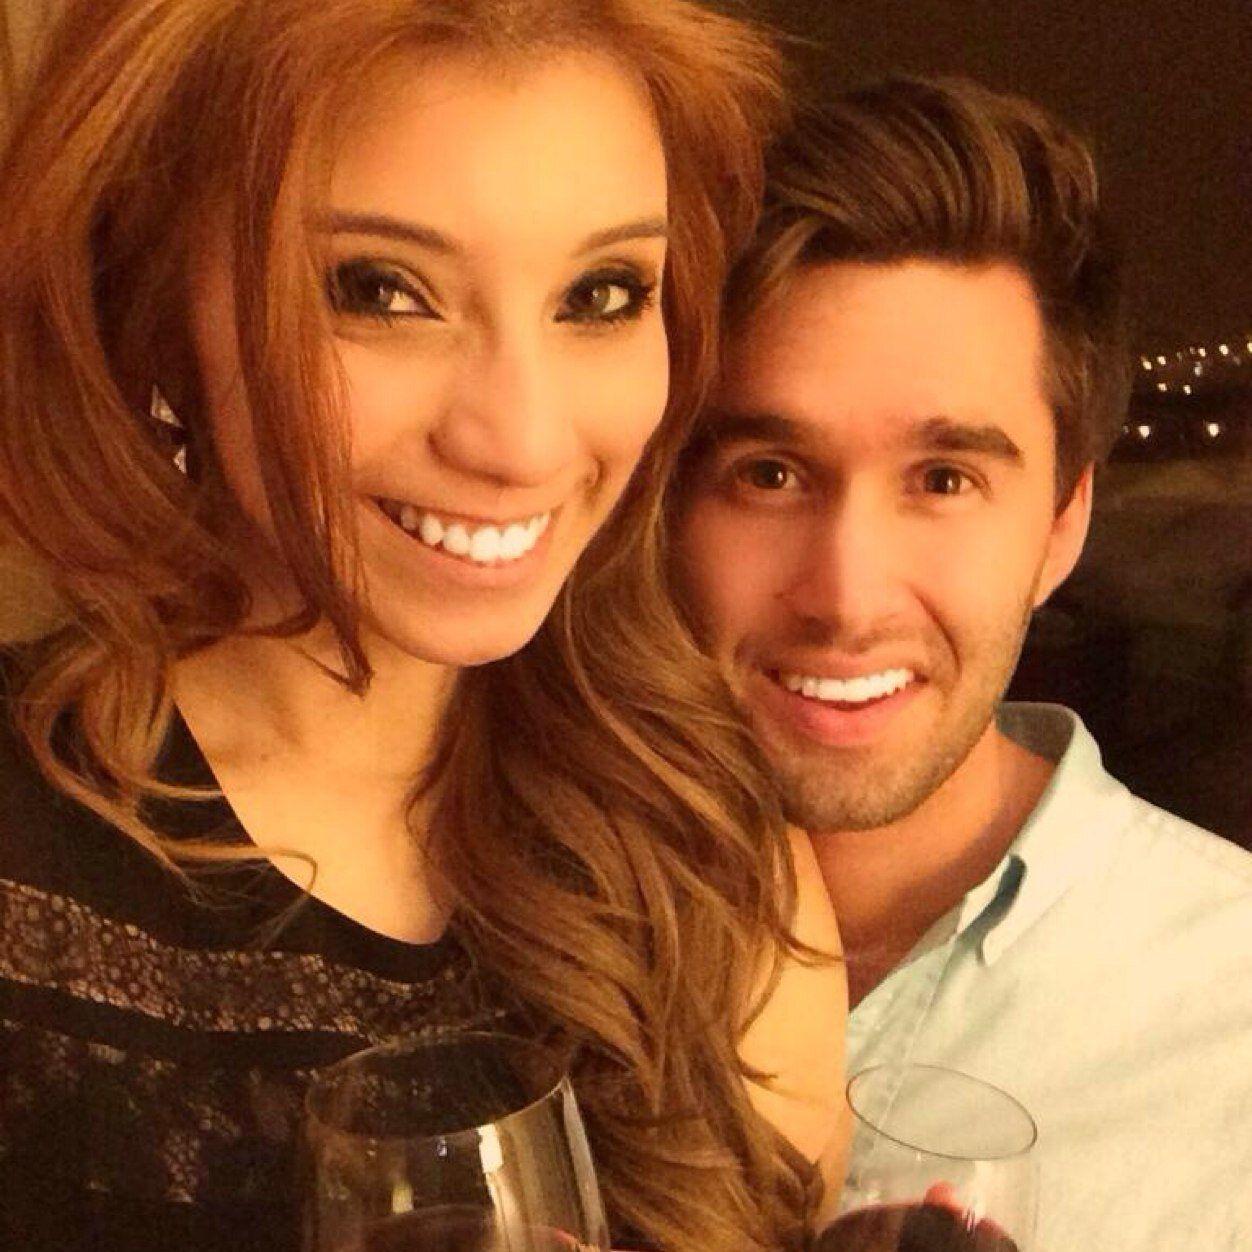 Avi and kirstie pentatonix dating sim